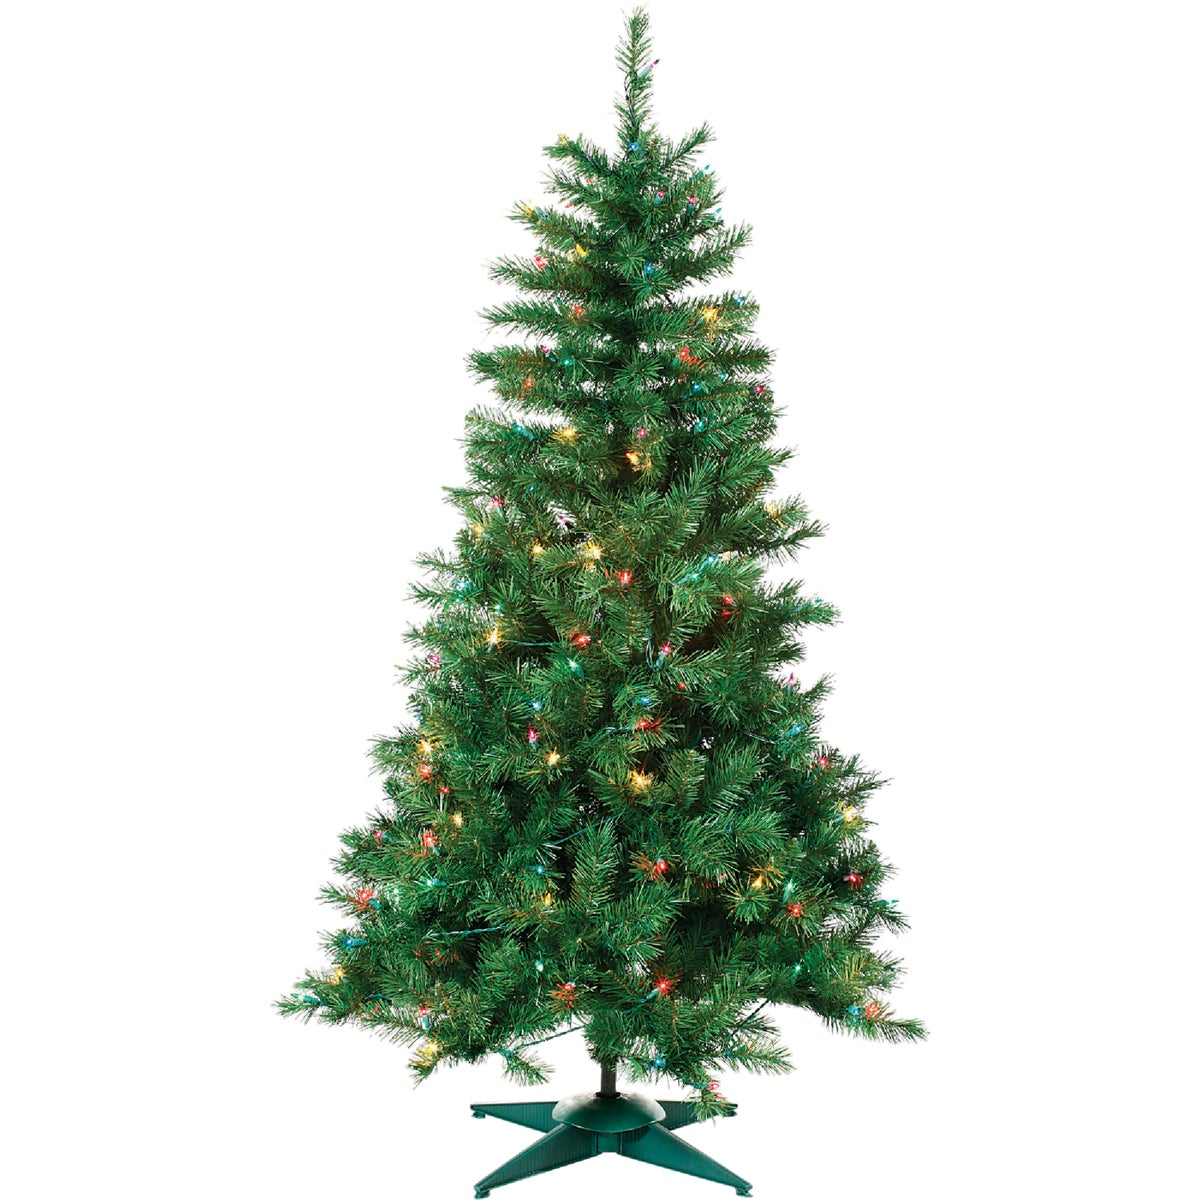 3'P/L COLRAD SPRUCE TREE